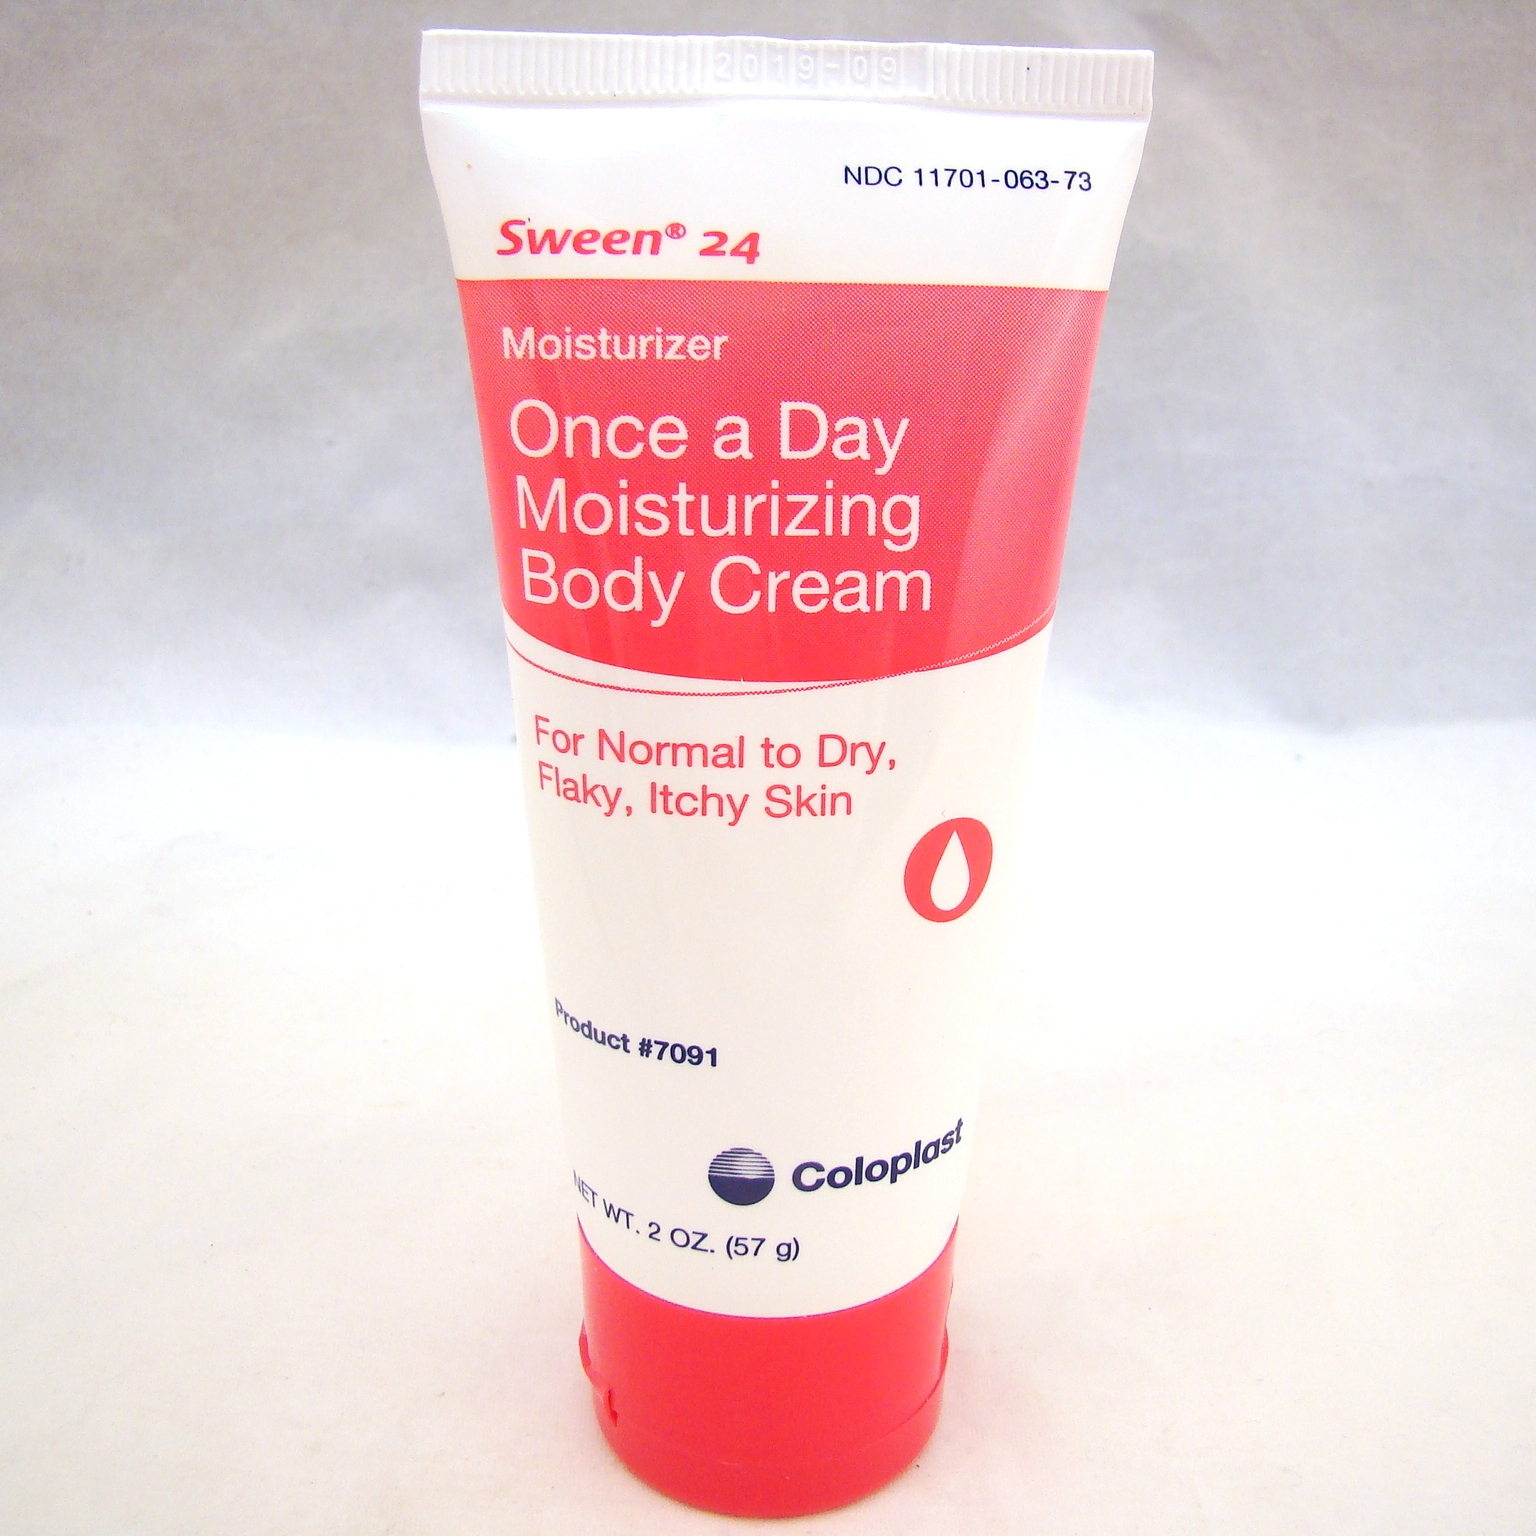 COLOPLAST Moisturizer Sween 24 2 oz. Tube #7091 LED 3 Colors Photon Ultrasonic Ultrasound Skin Care Home Beauty Facial Device